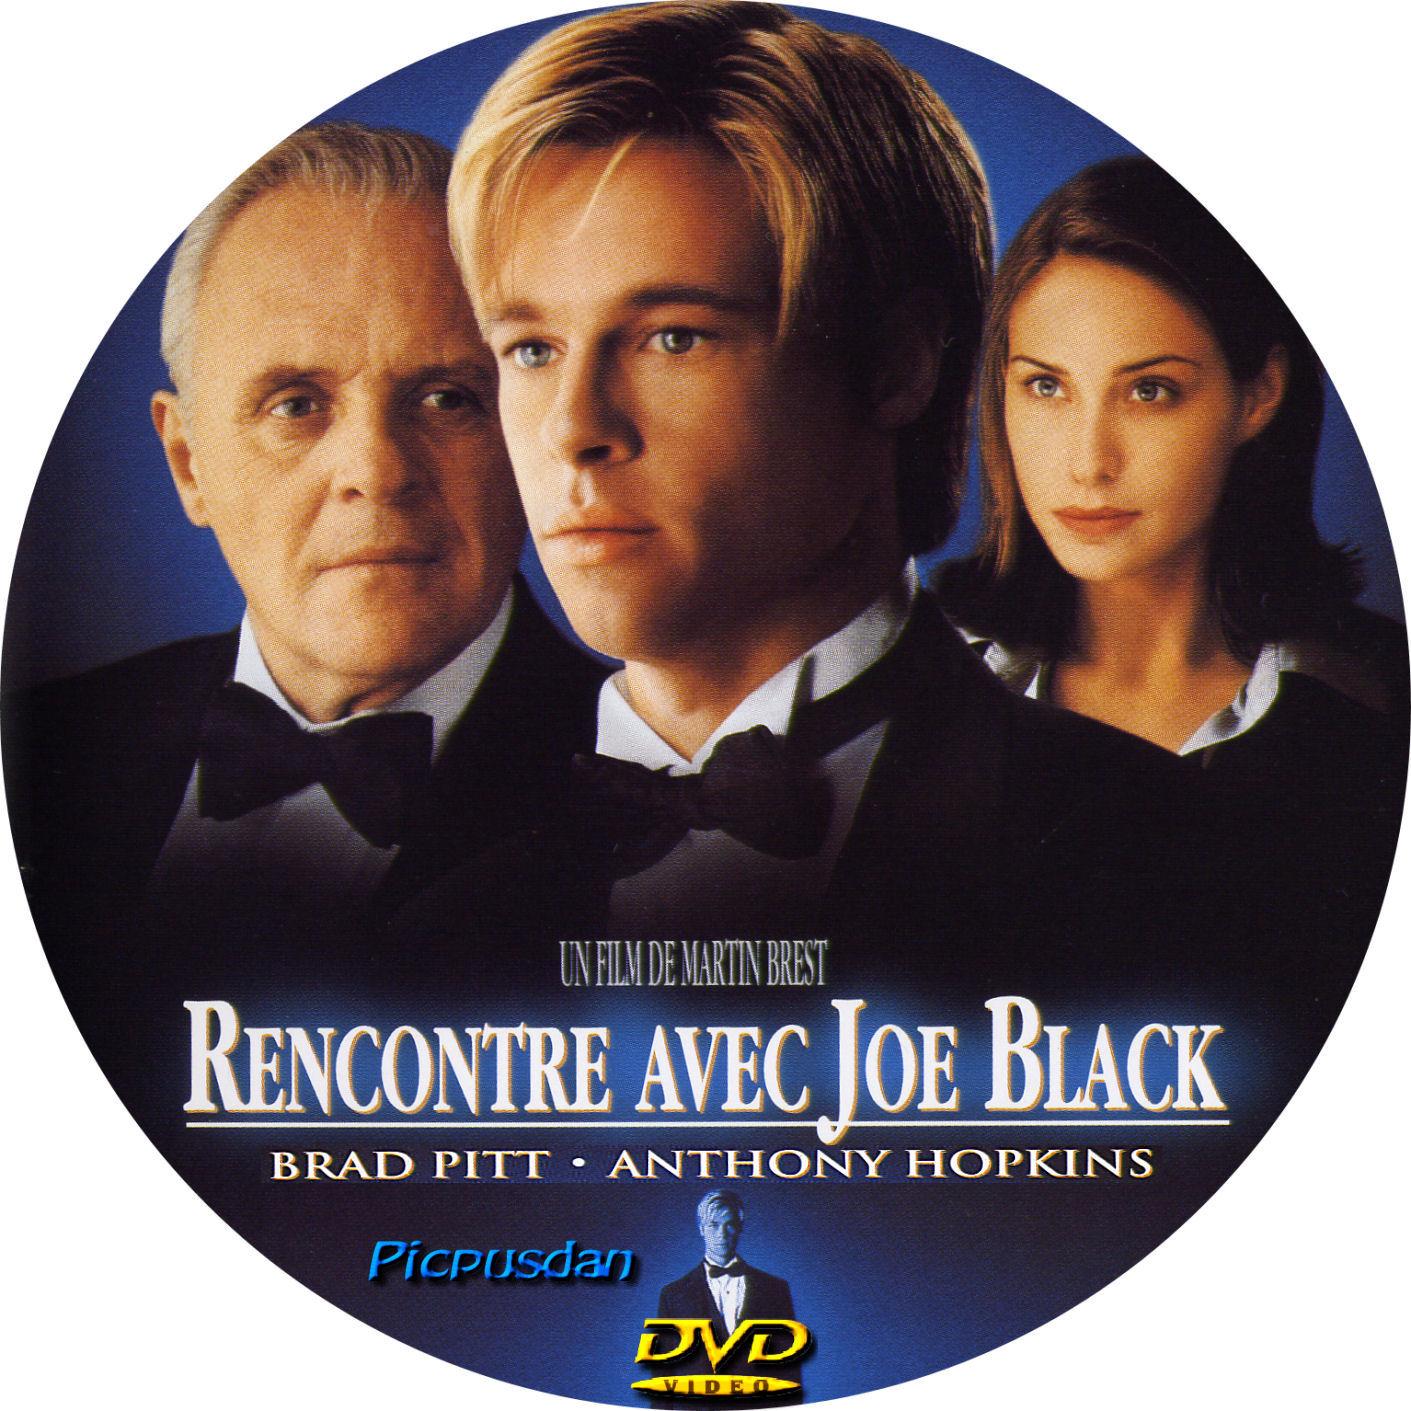 RENCONTRE AVEC JOE BLACK.